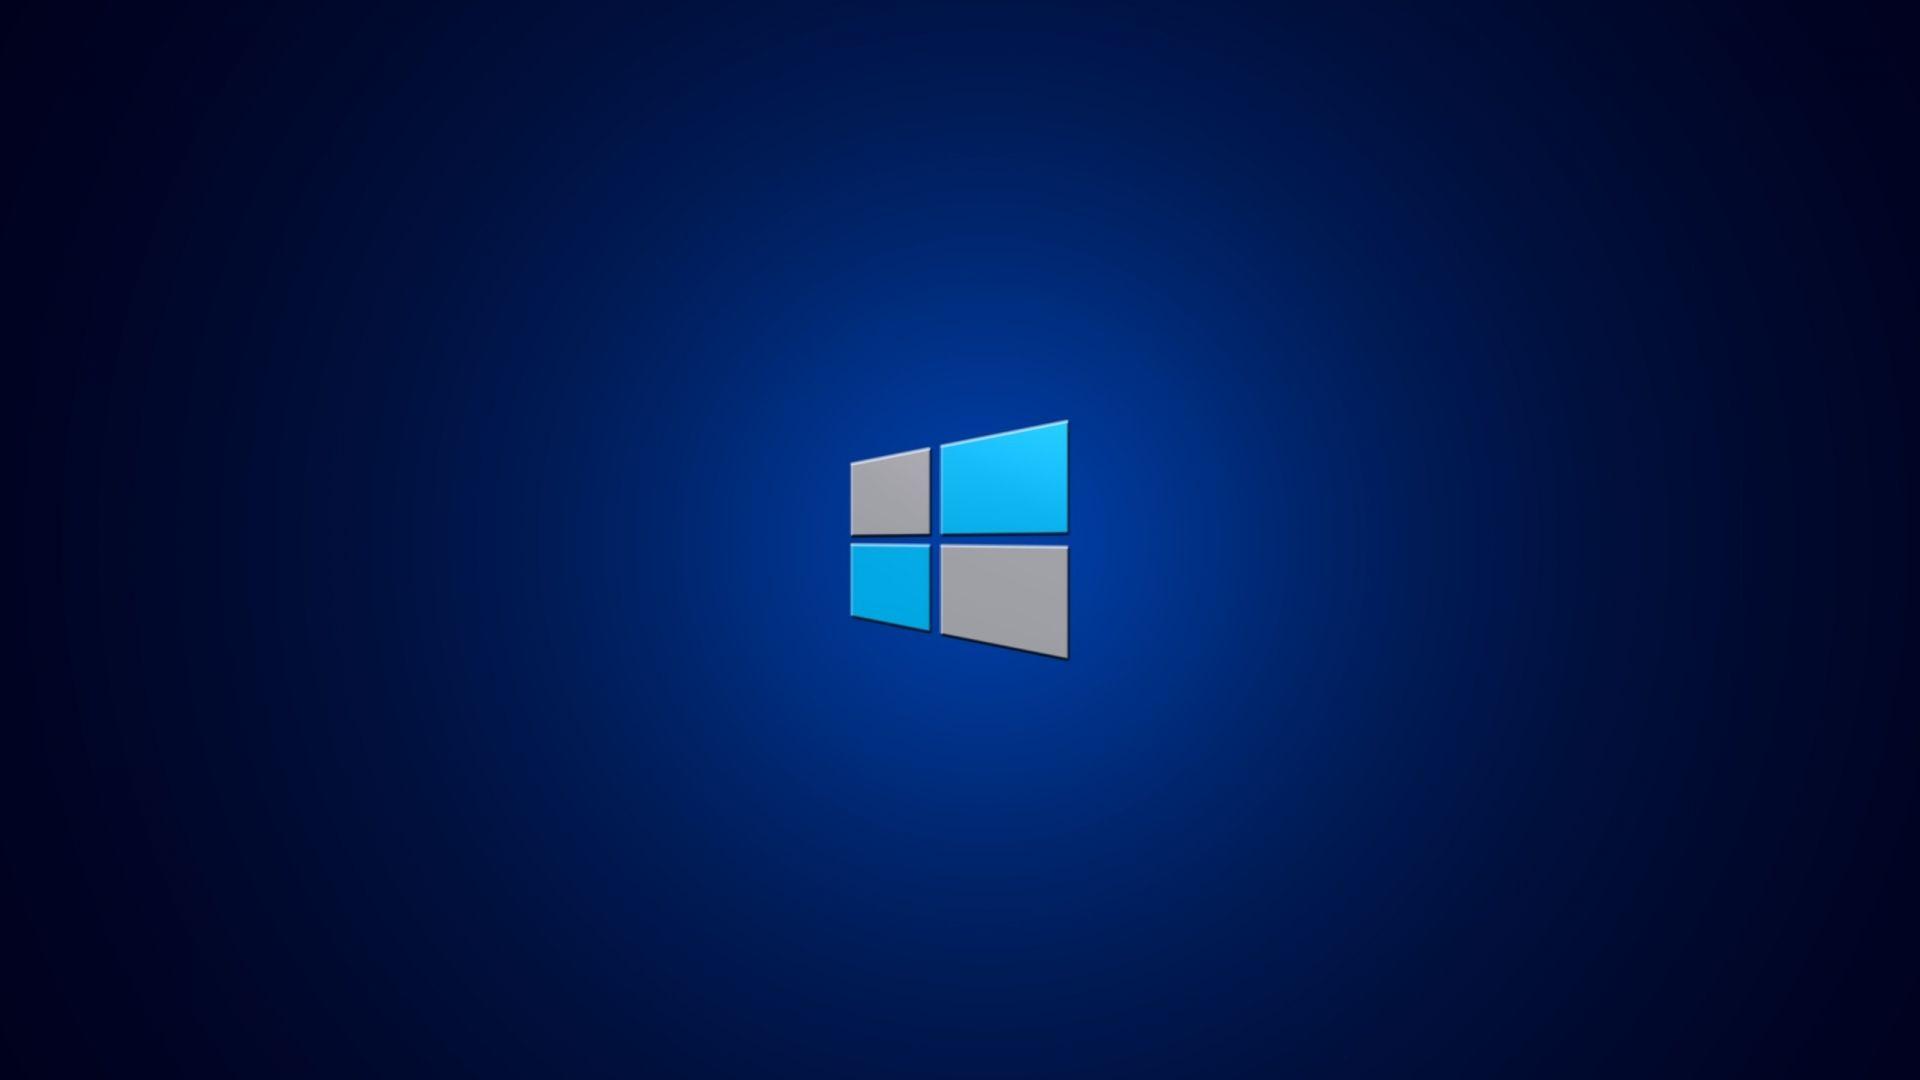 Windows Windows Wallpaper Wallpaper Windows 10 Windows Desktop Wallpaper